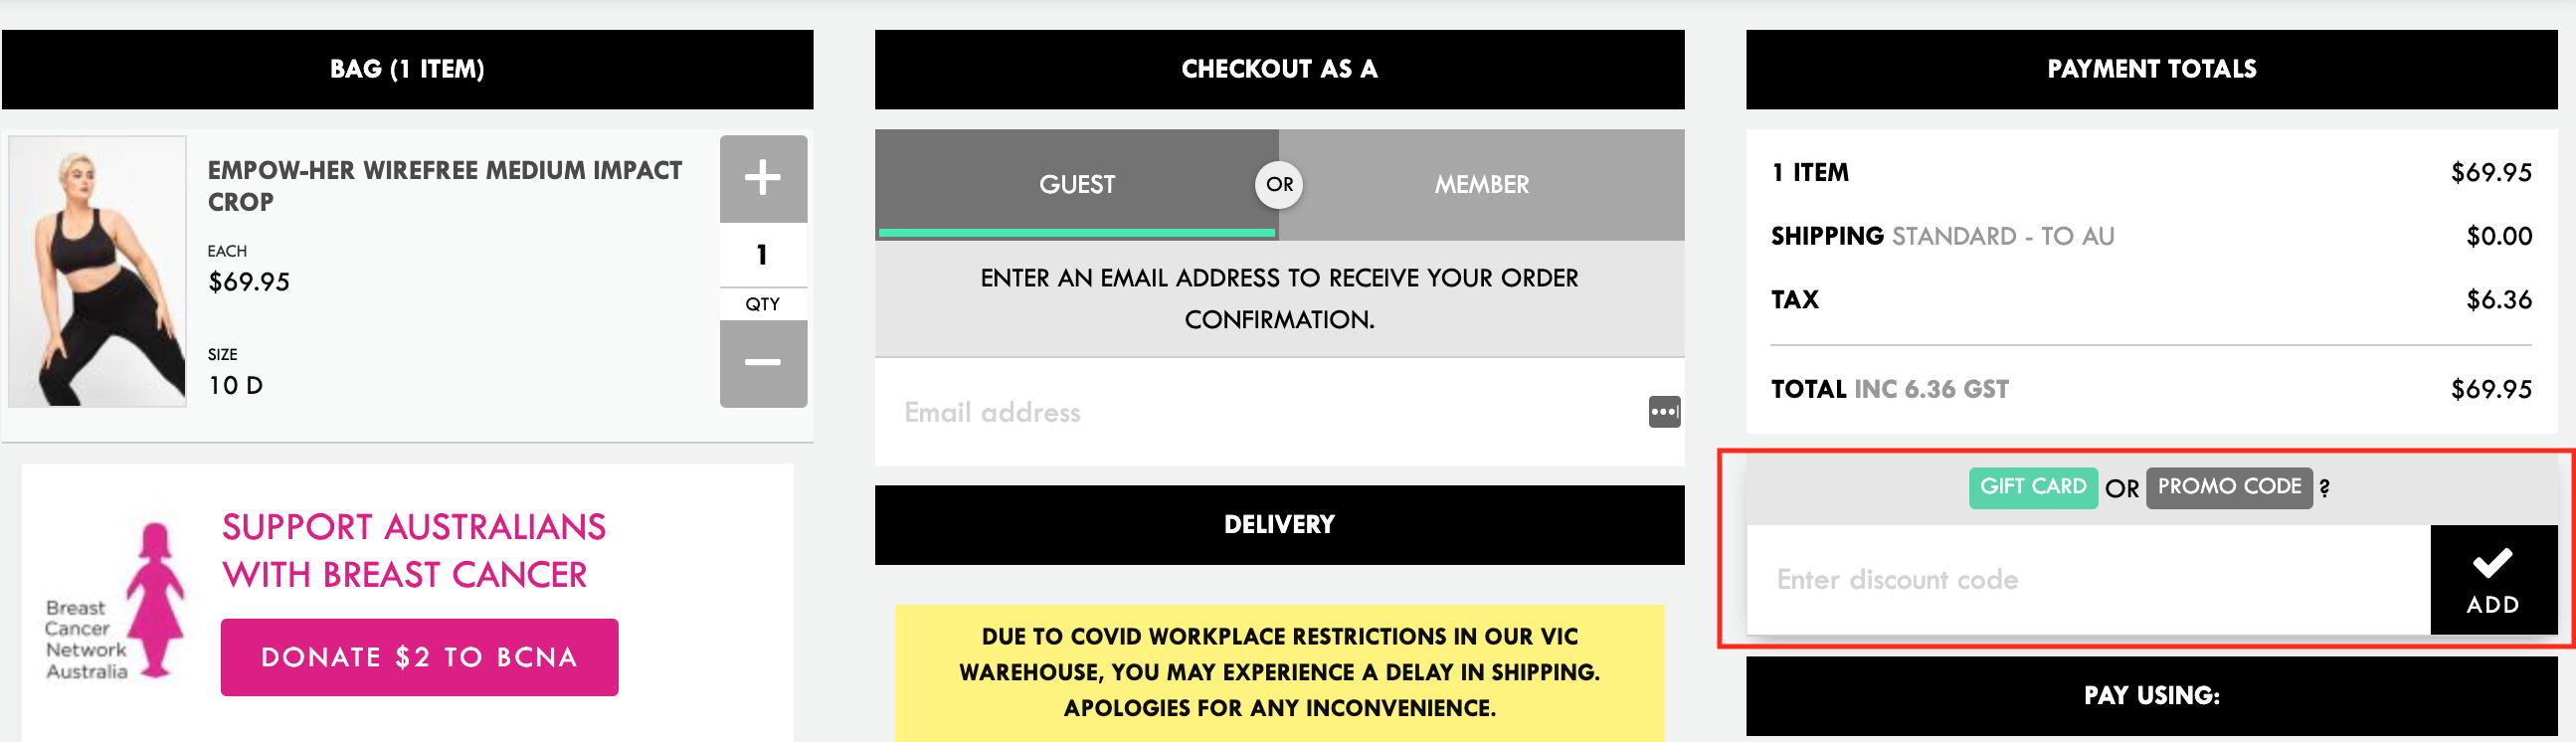 berlei discount code